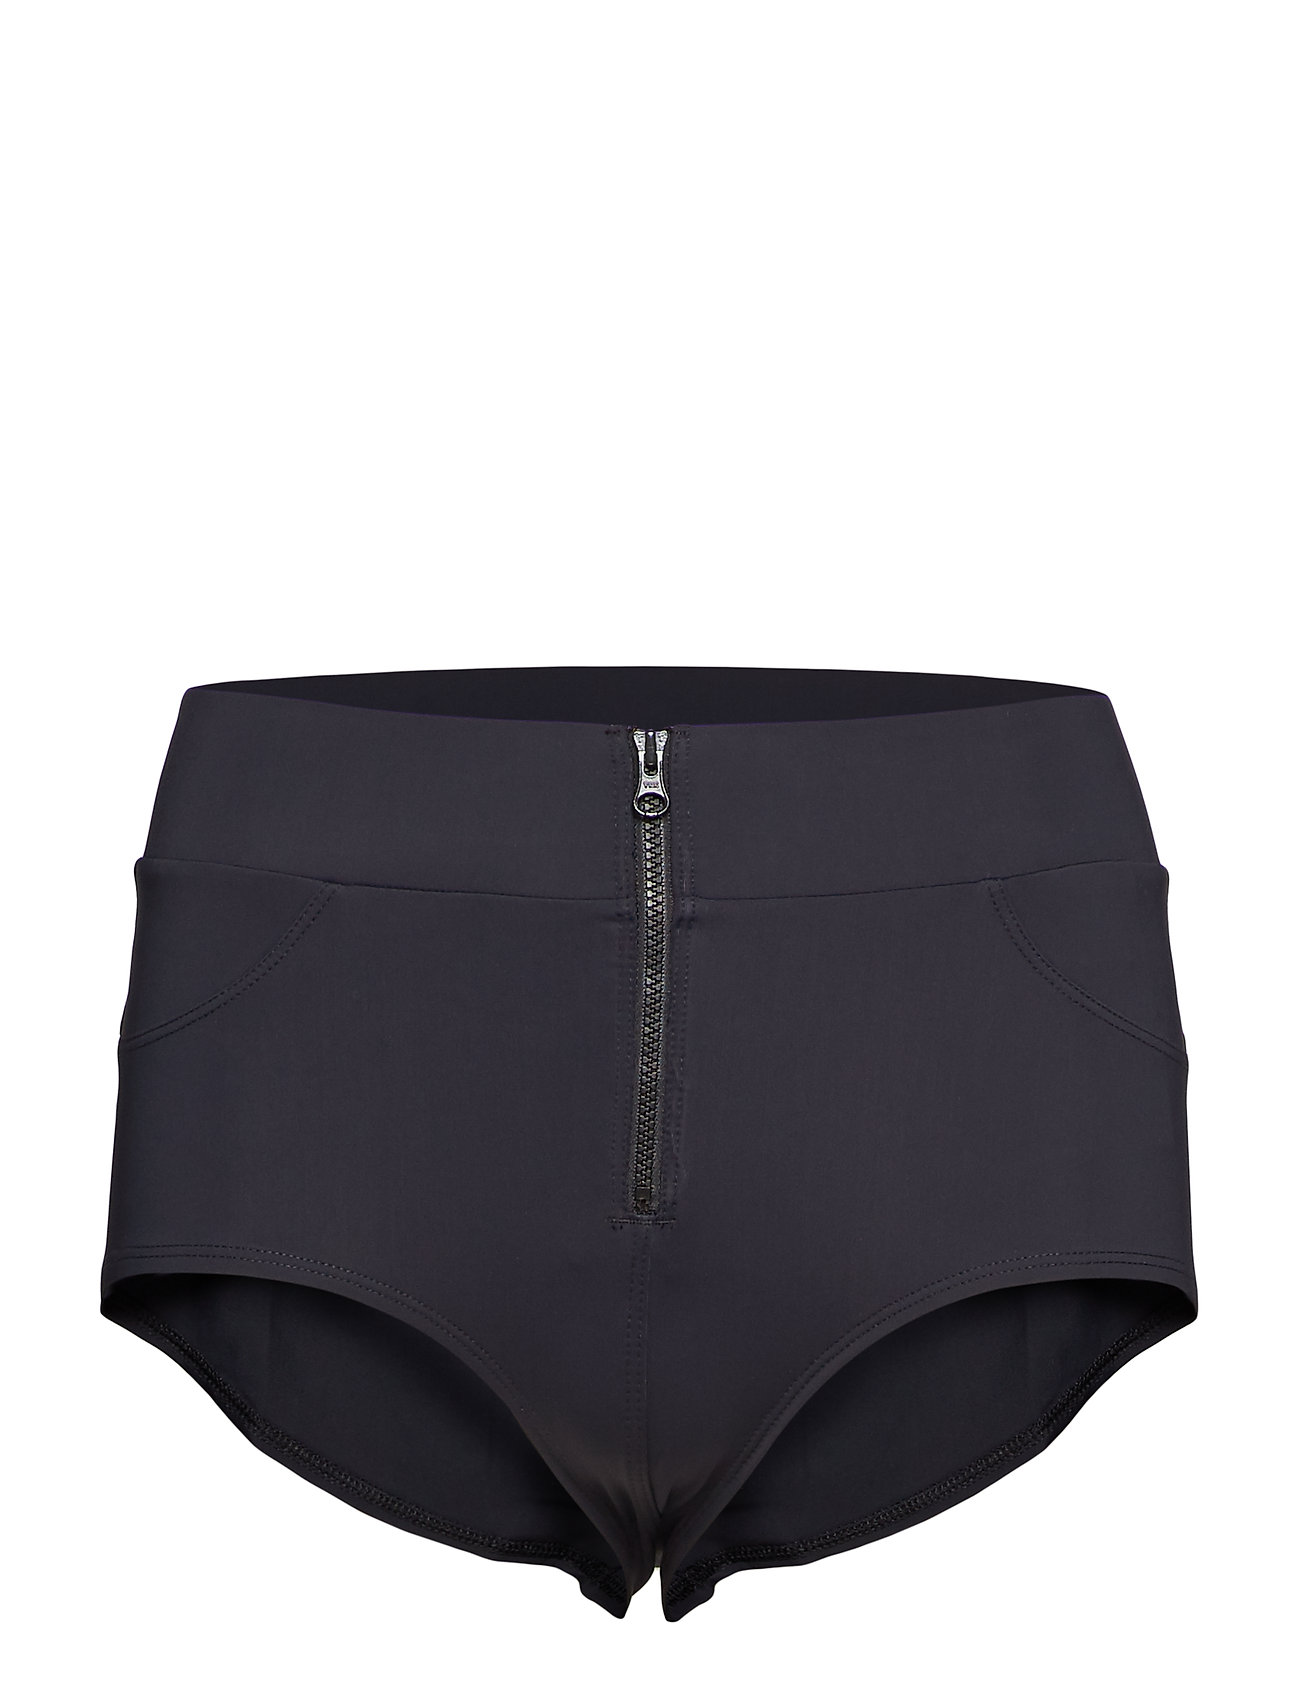 Adidas by Stella McCartney TRIATHLON SHORT Shorts